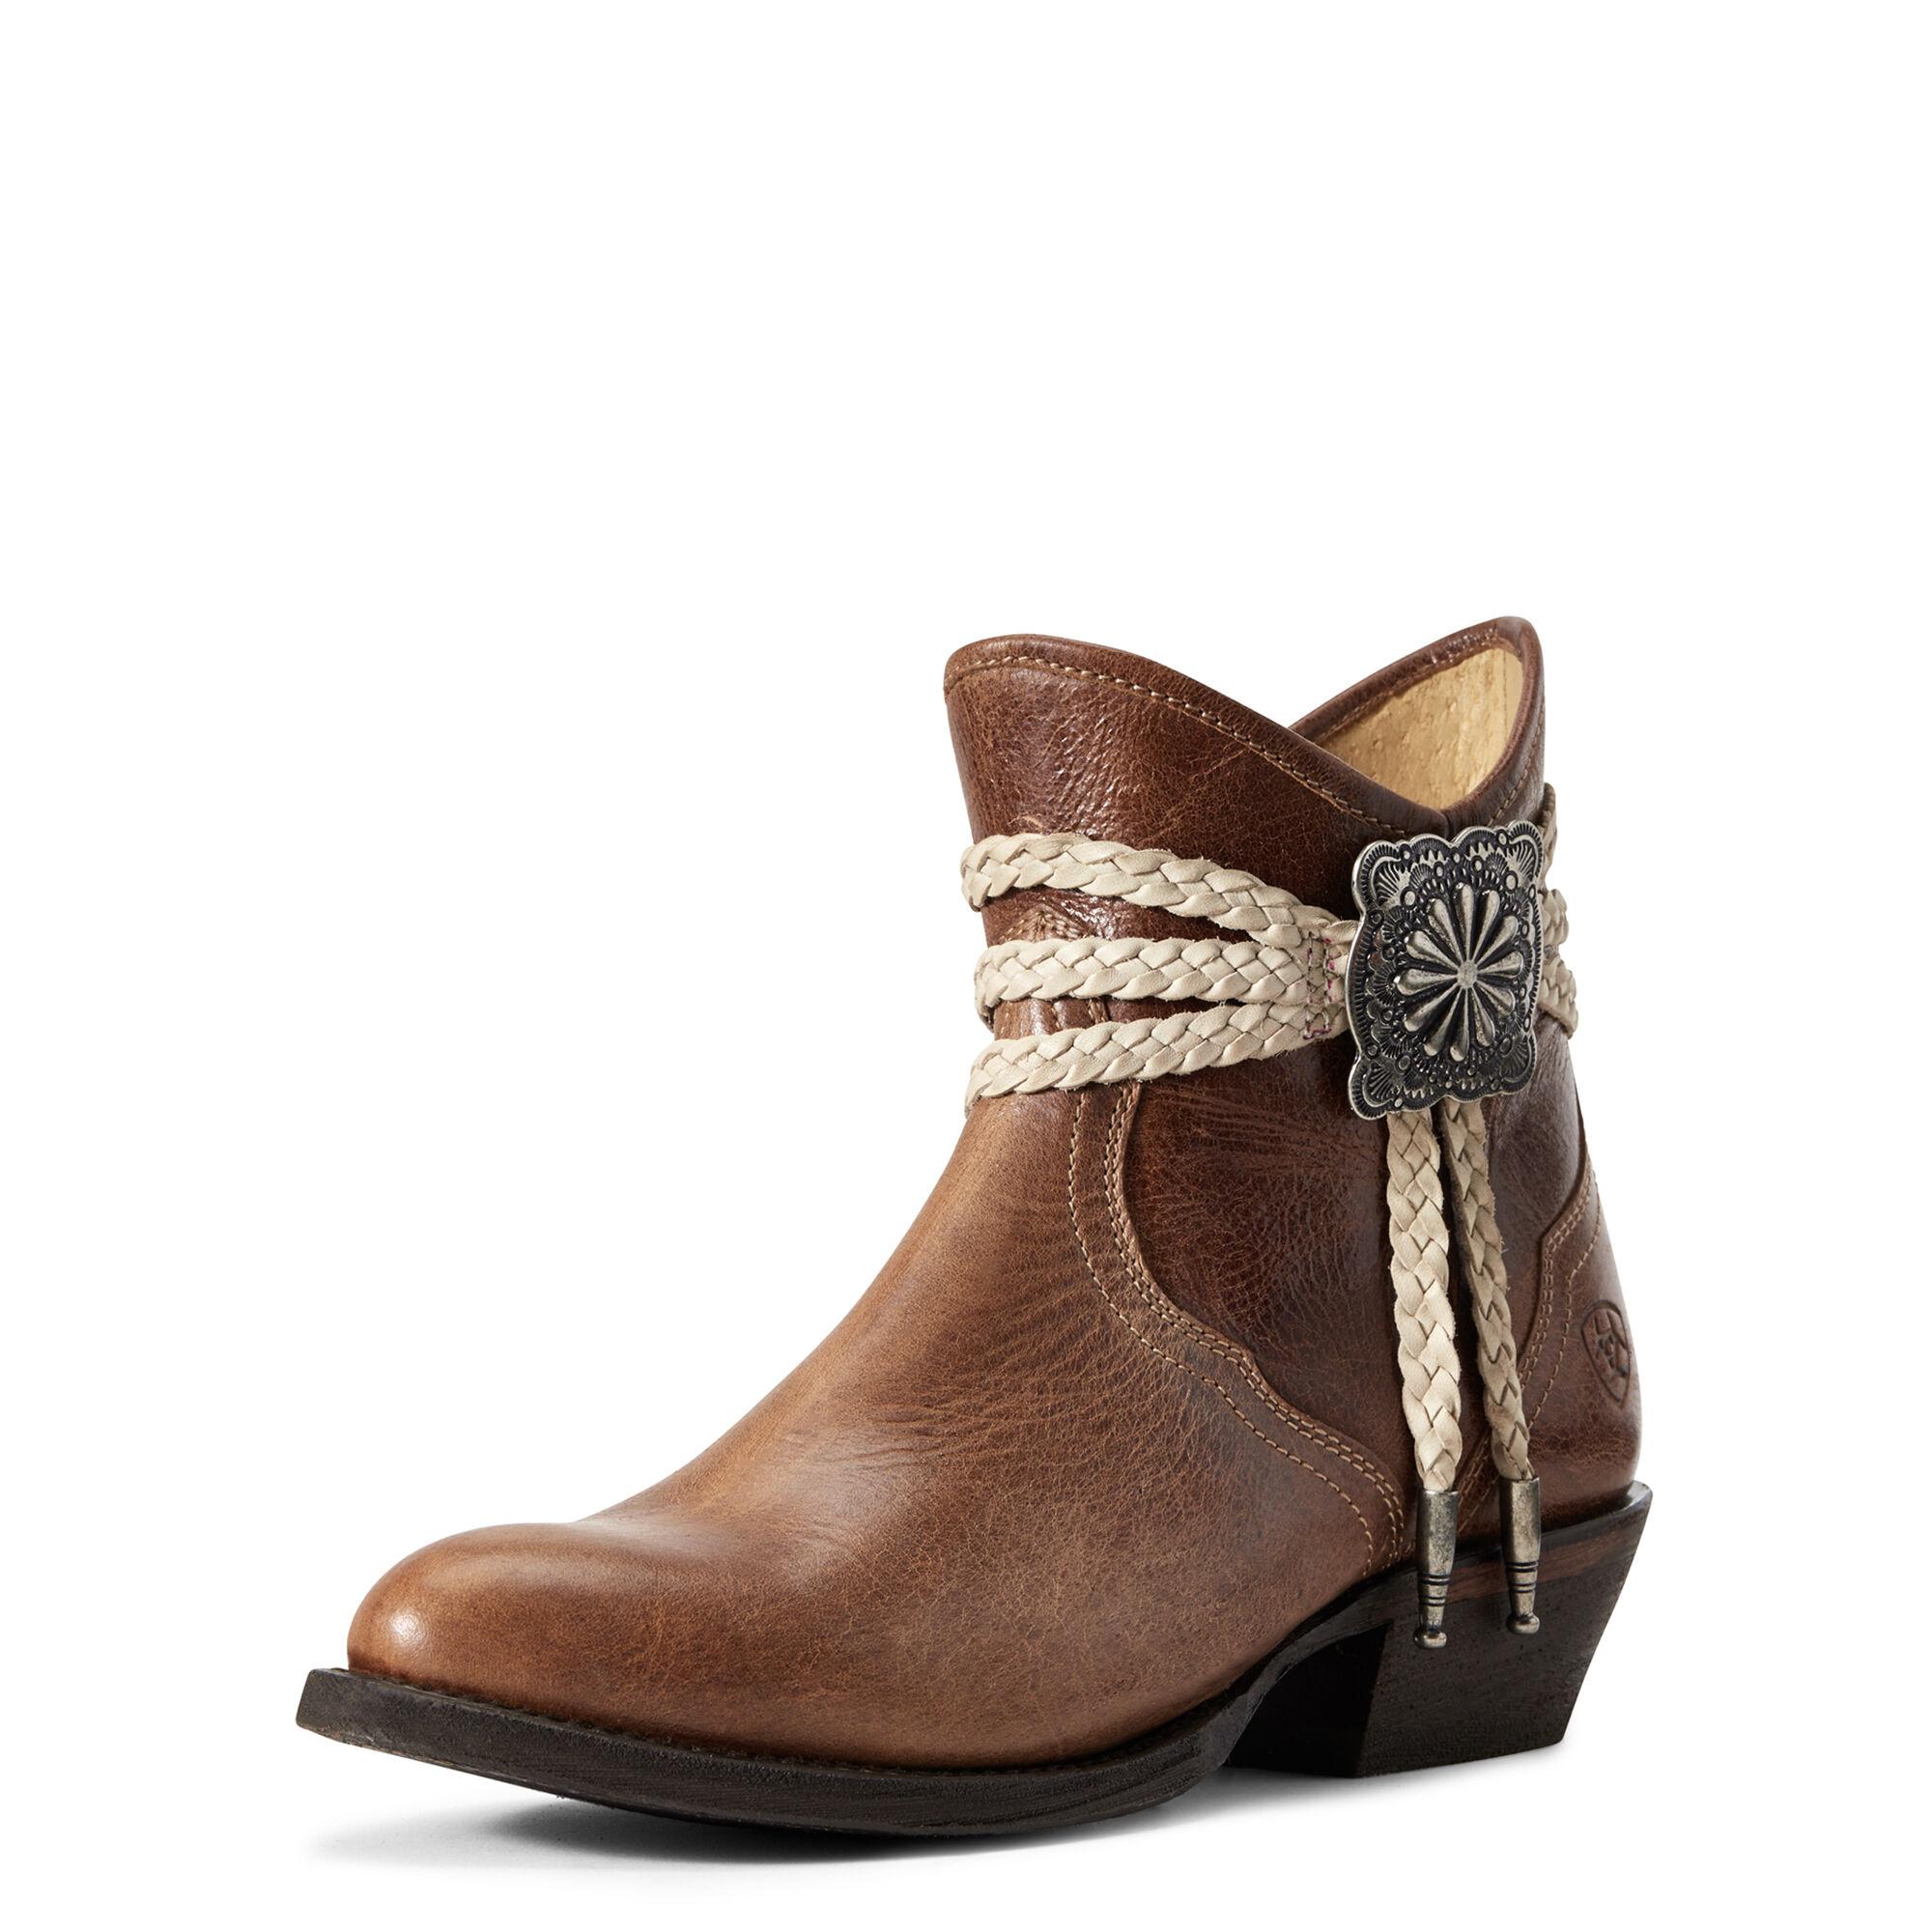 Women's Circuit Sage Western Boots in Dark Tan by Ariat